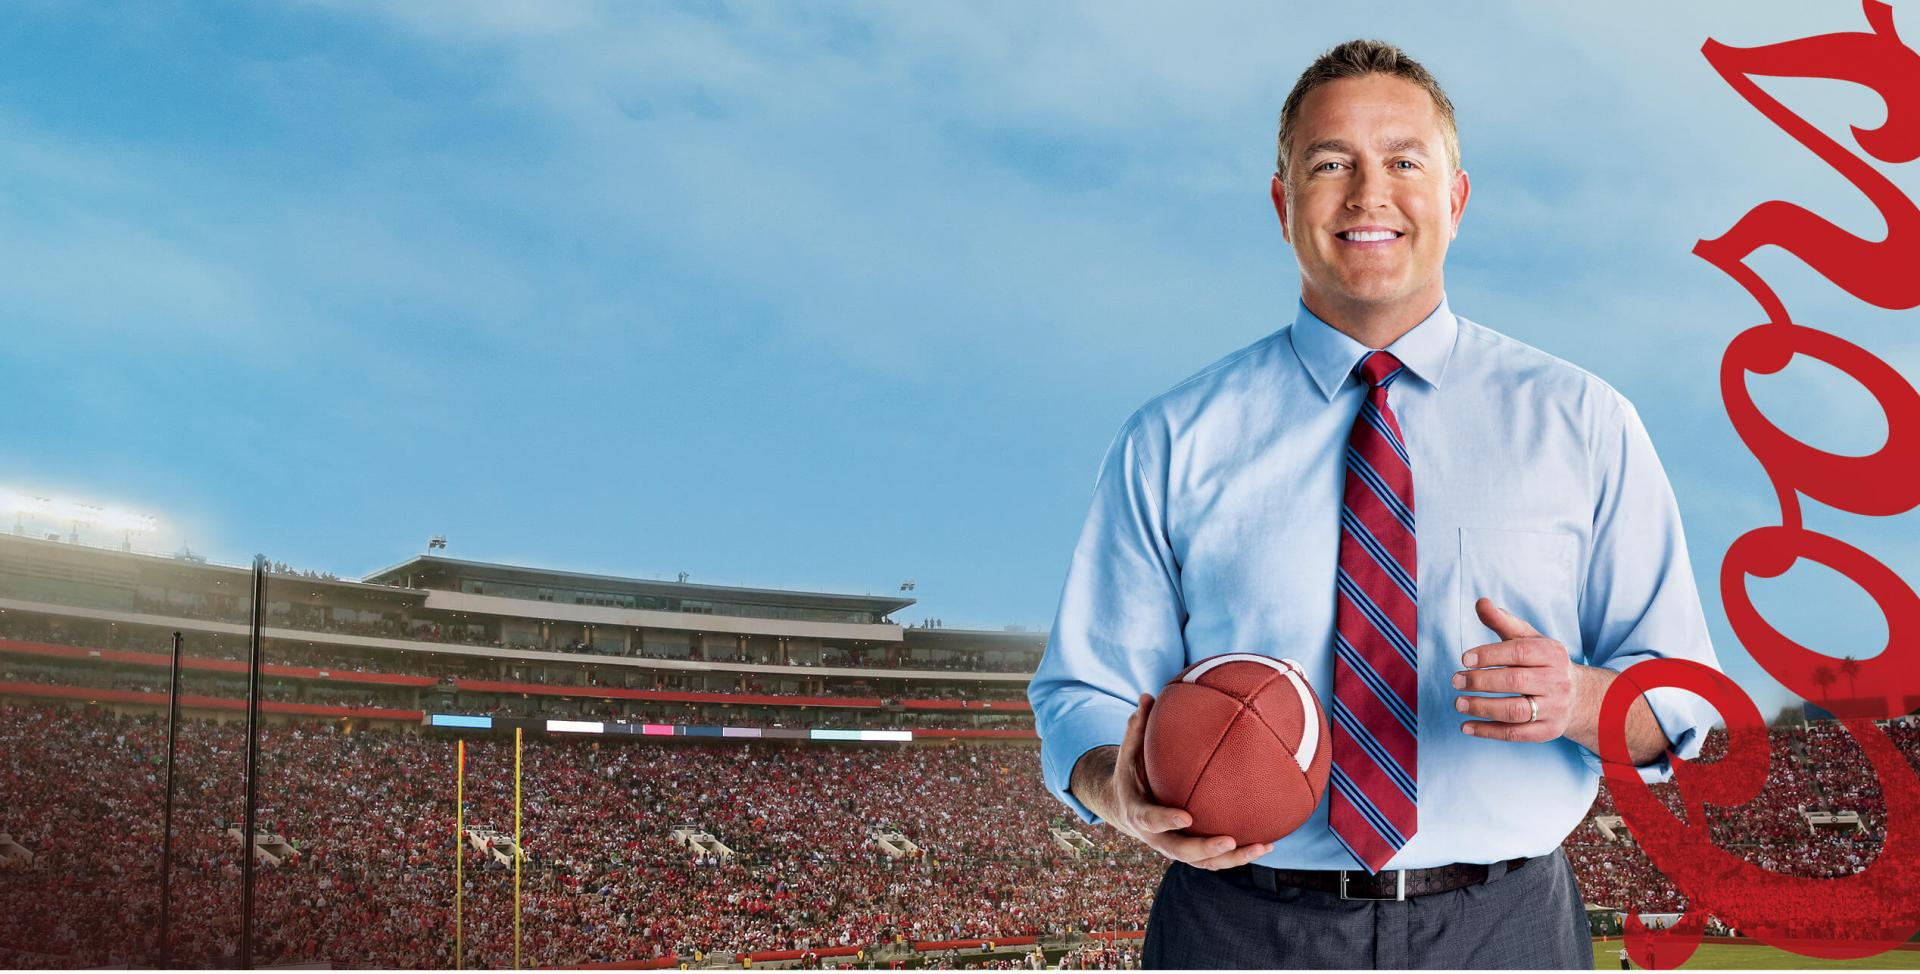 Man at stadium holding an american football ball